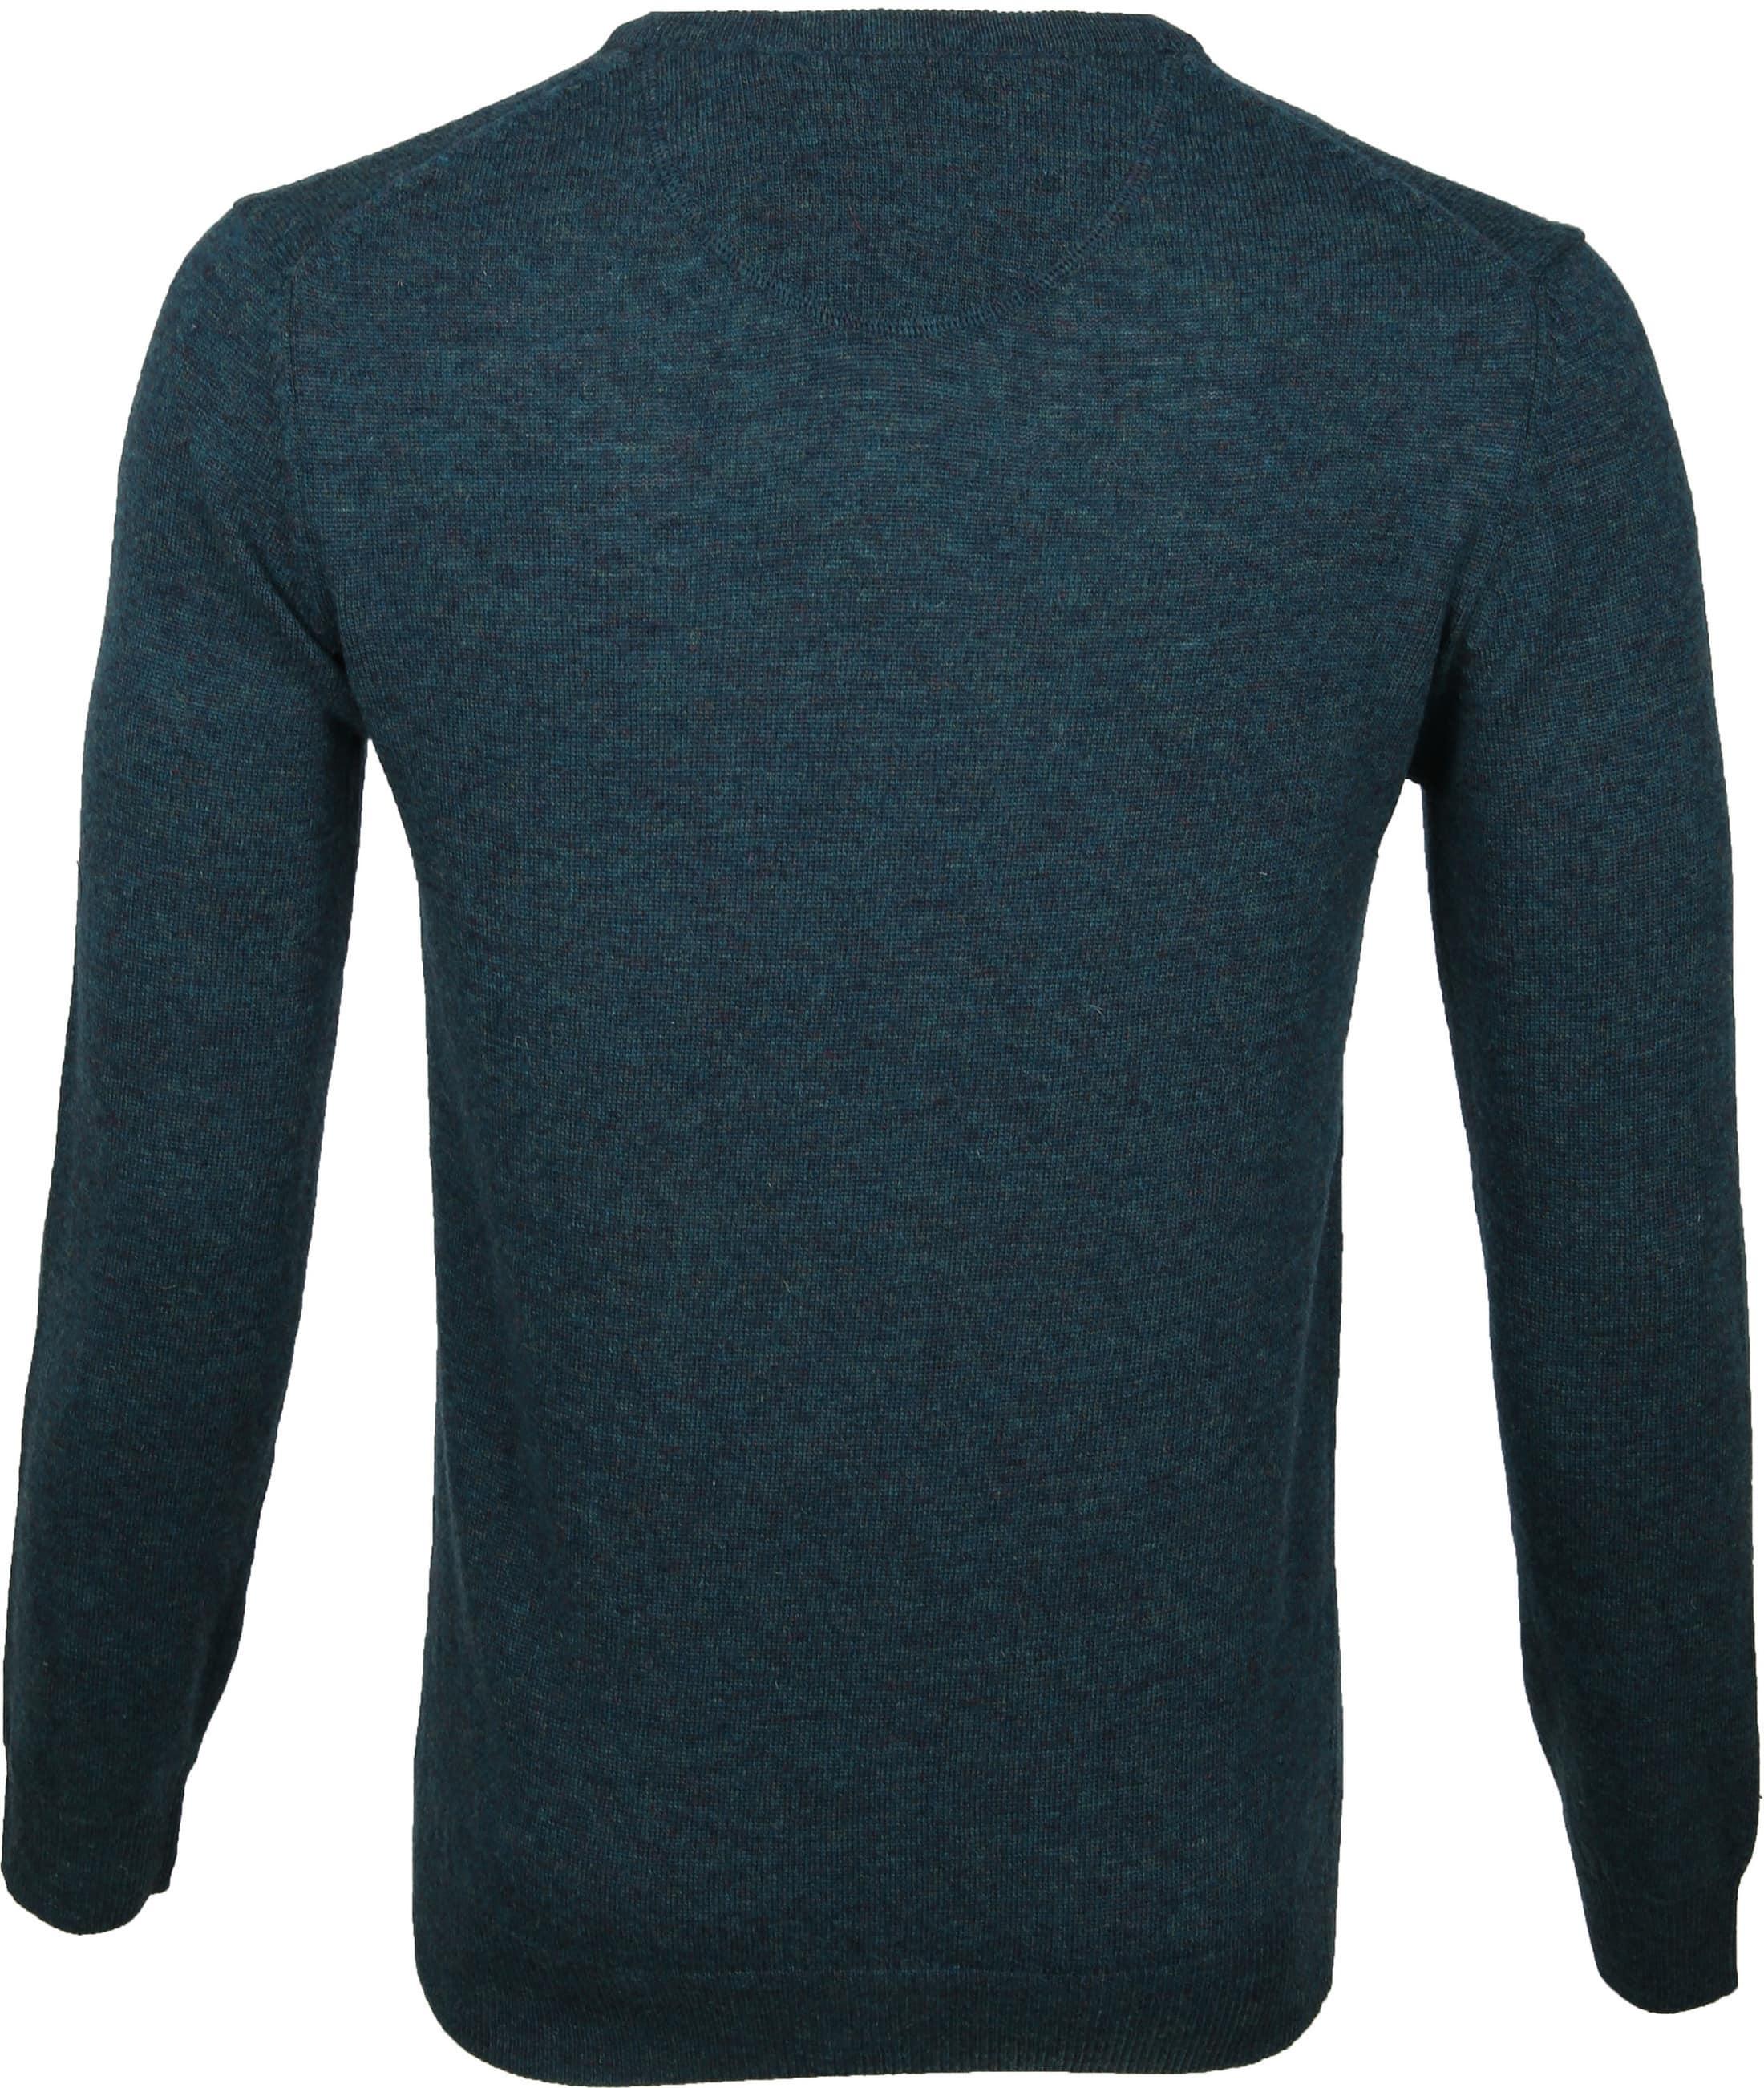 Suitable Pullover V-Hals Lamswol Groen foto 4